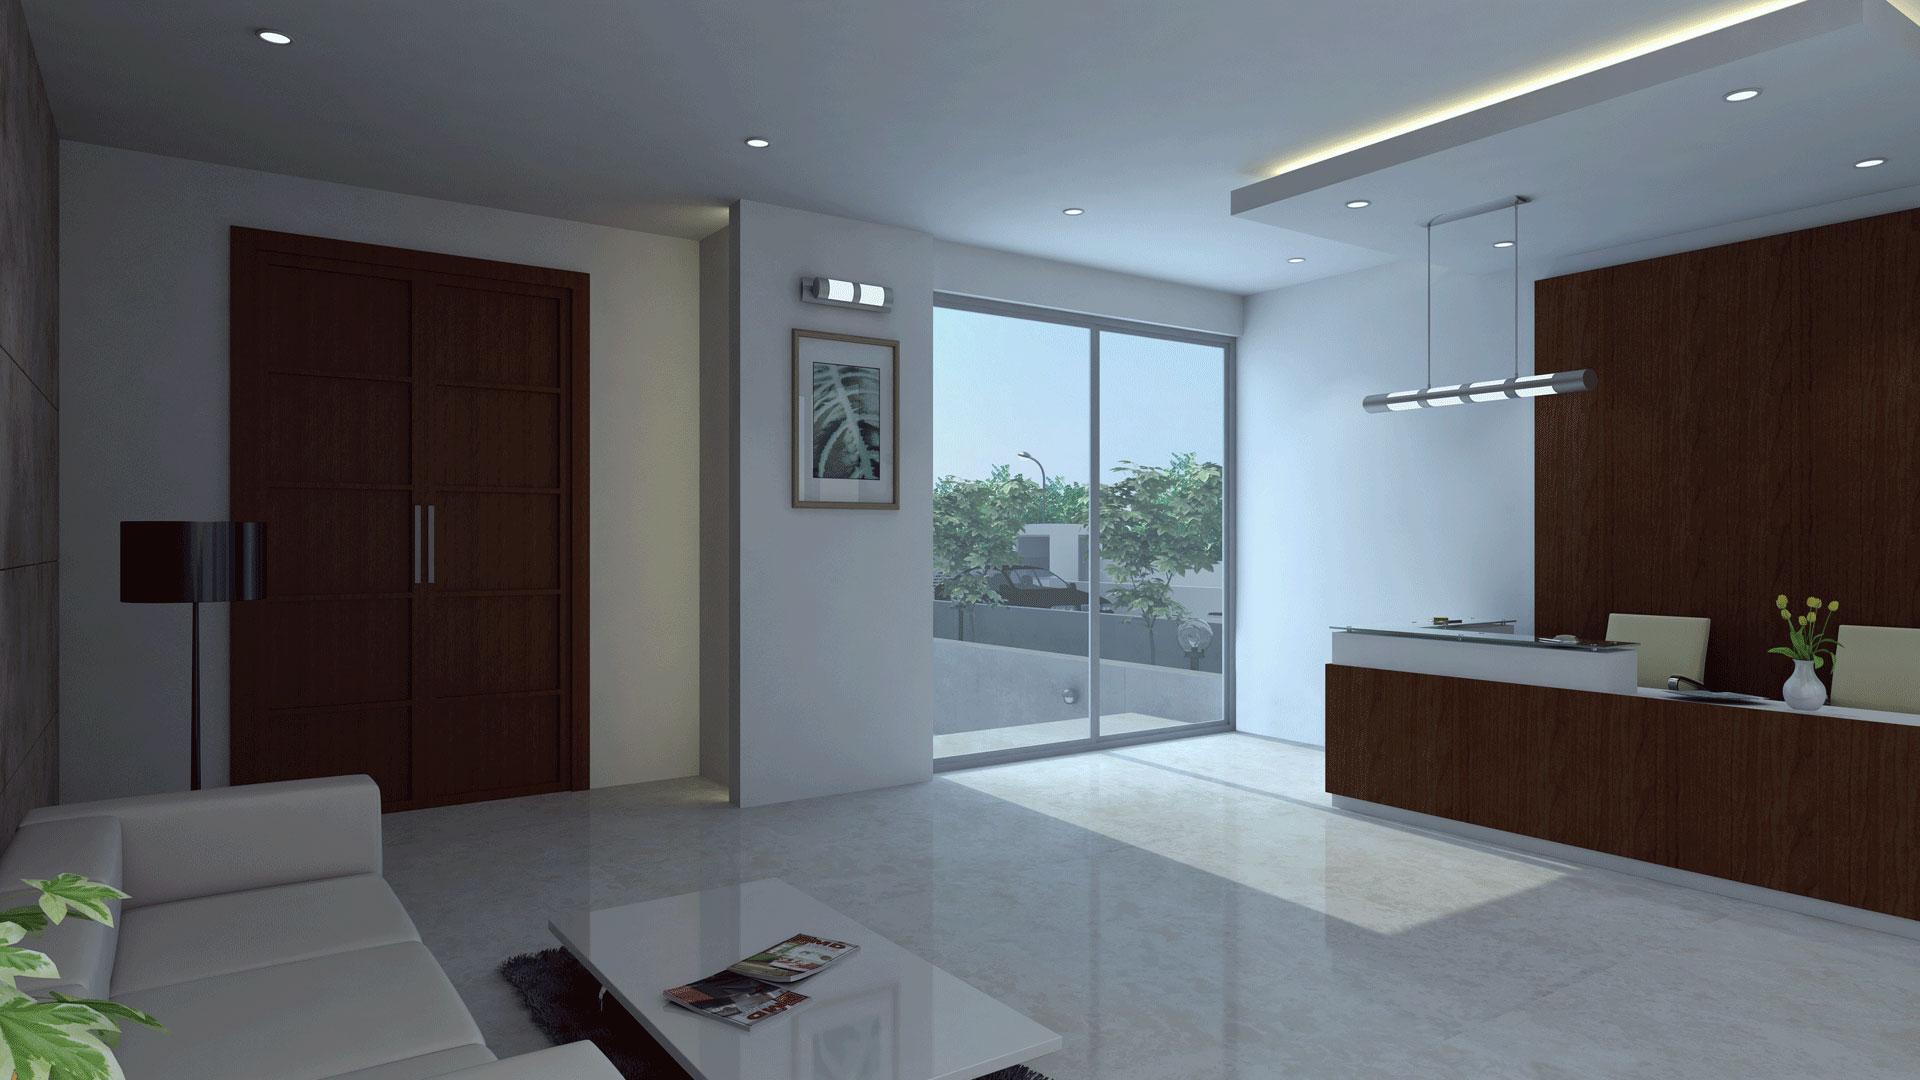 prestige-deja-vu-Apartment-in-pulkeshi-Nagar-Bangalore-Image-04